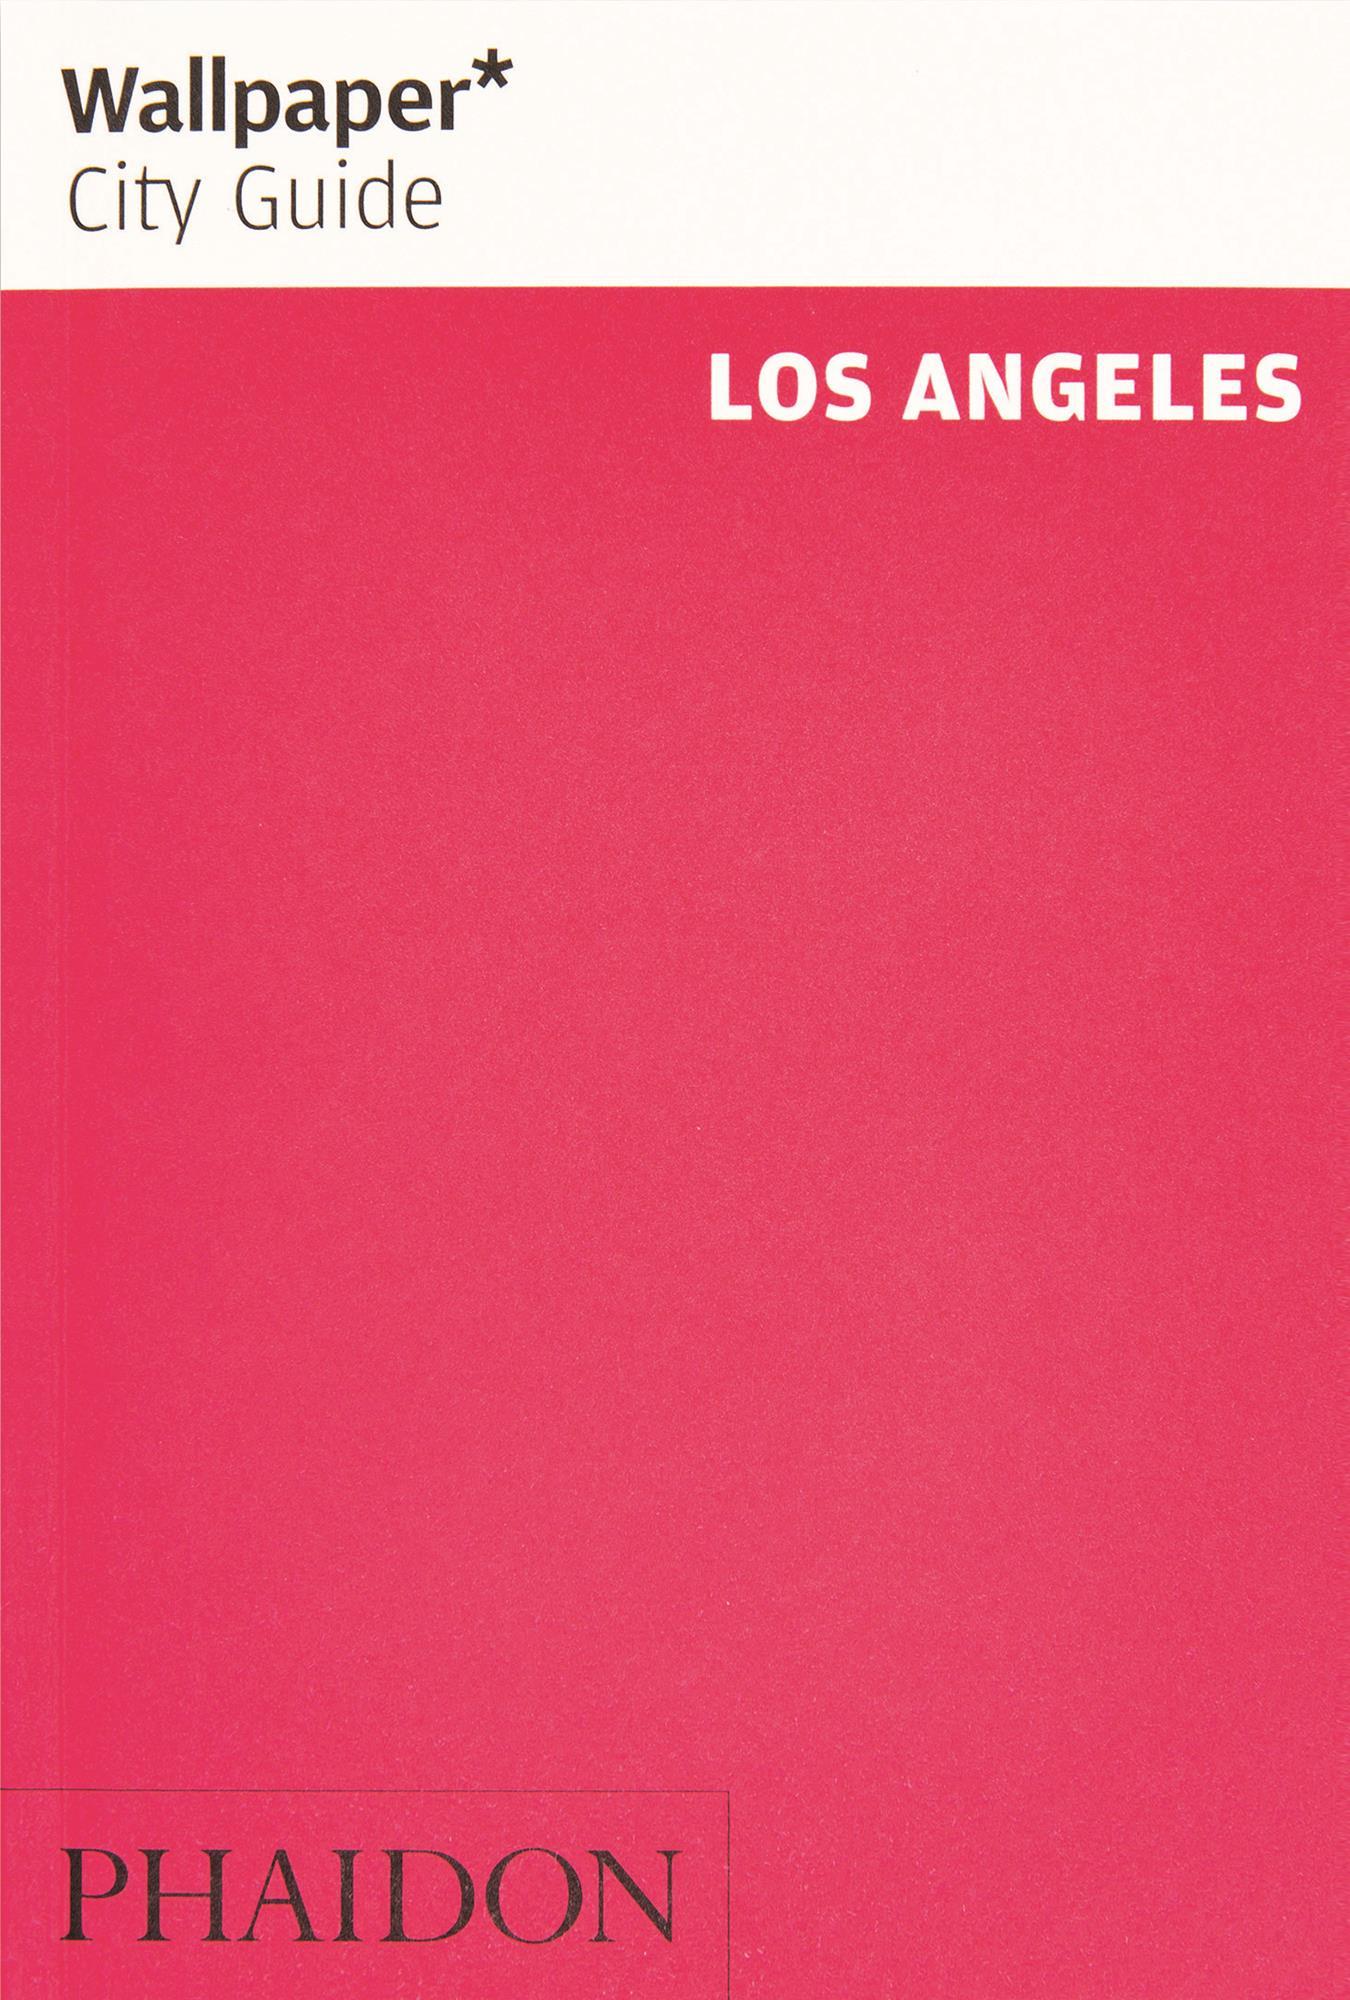 Wallpaper* City Guide Los Angeles